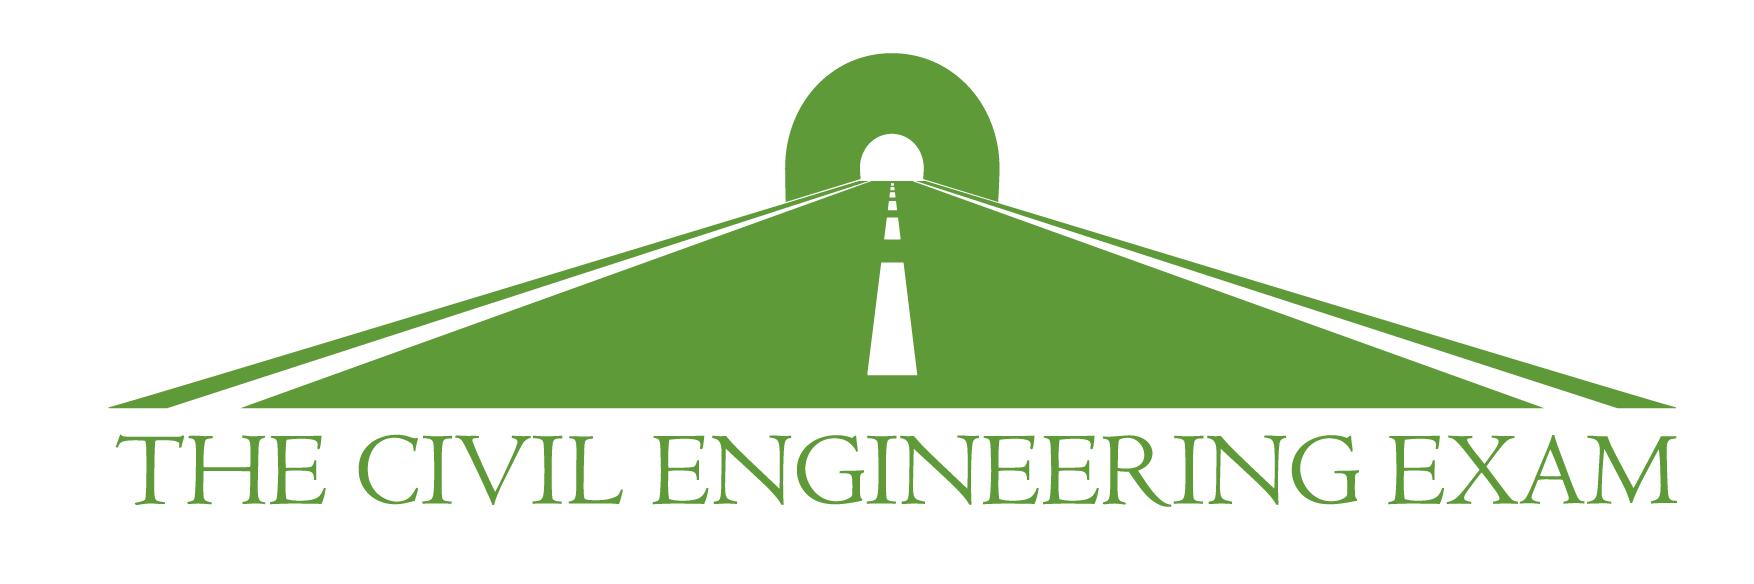 The Civil Engineering Exam